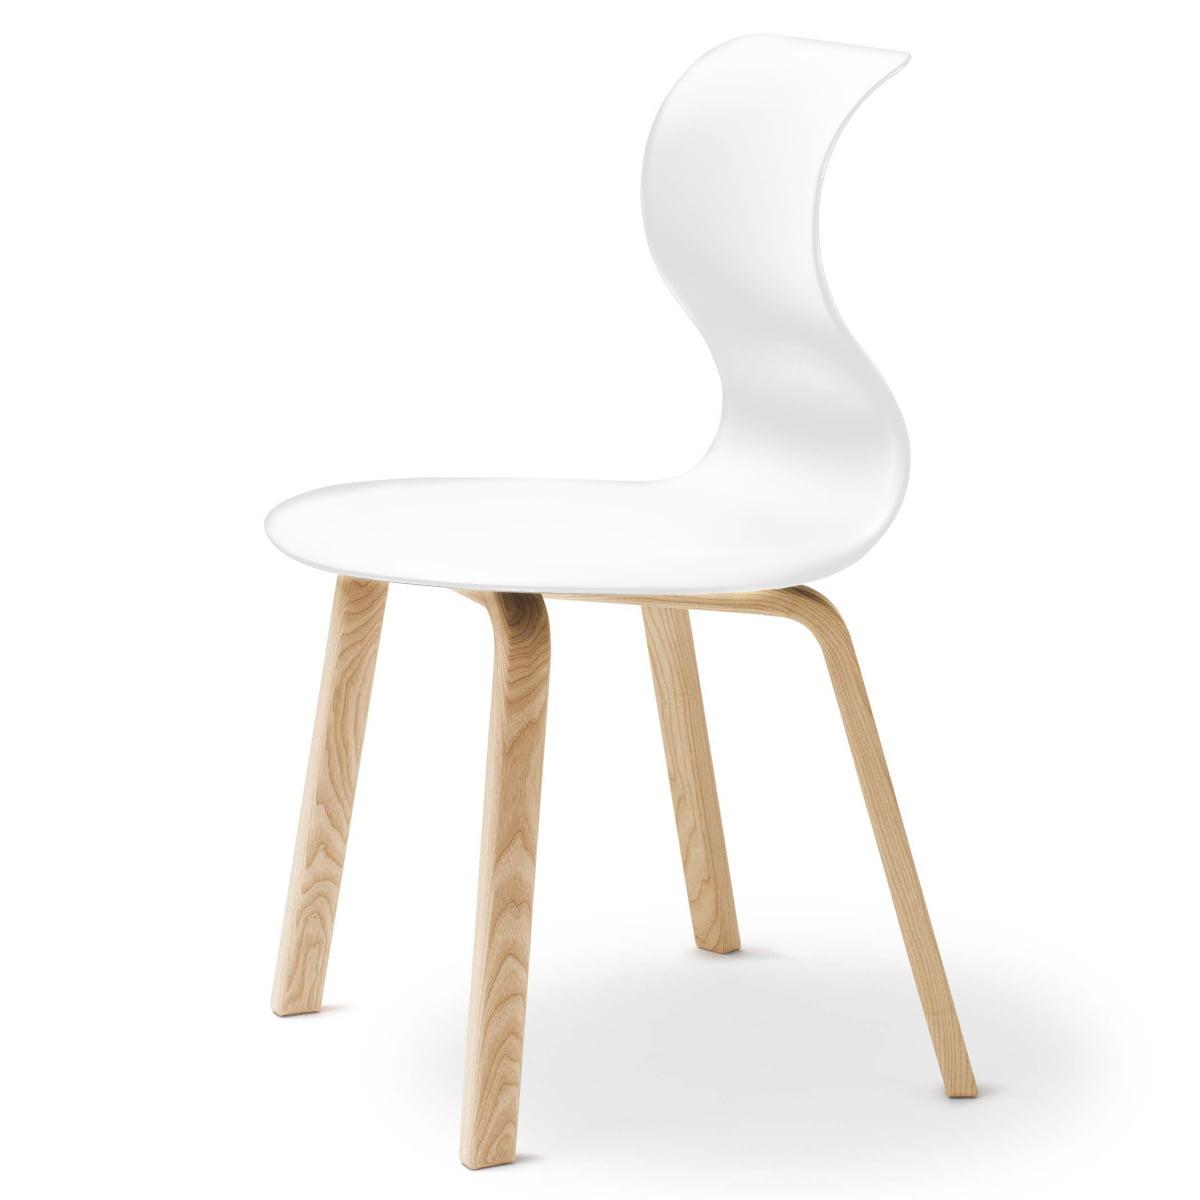 Remarkable Flototto Pro 6 Four Legged Wooden Frame Black Ibusinesslaw Wood Chair Design Ideas Ibusinesslaworg